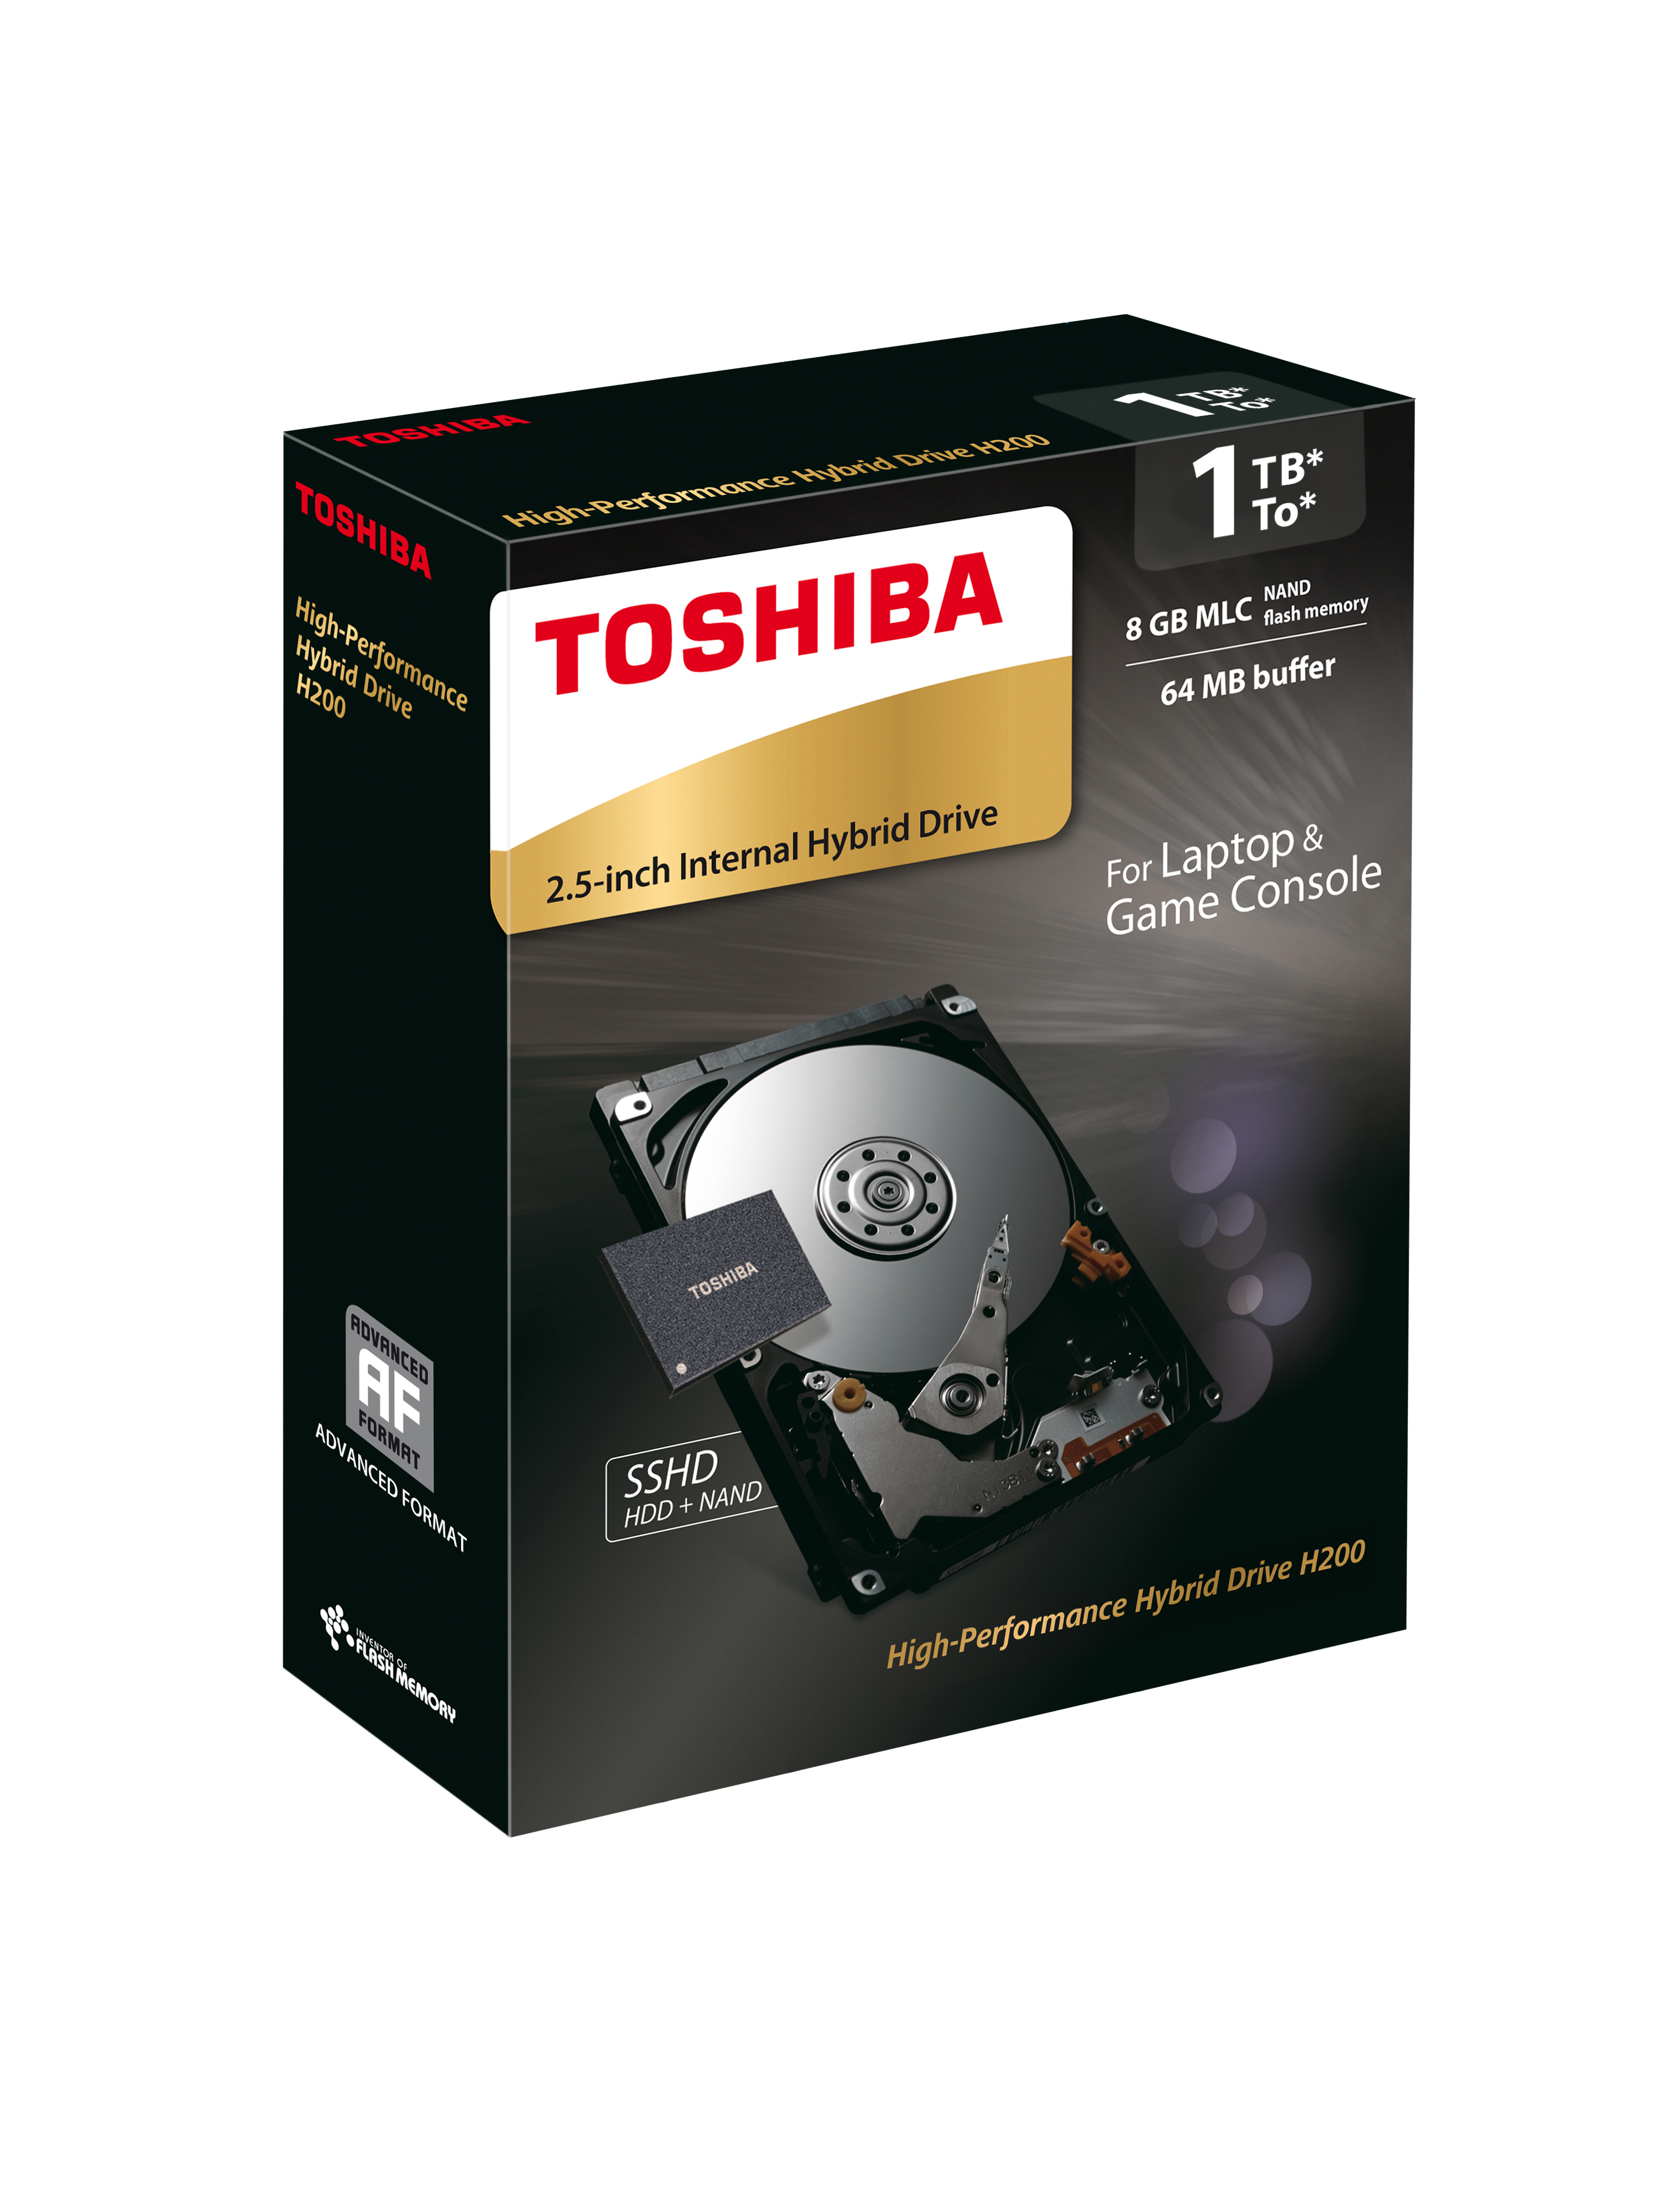 H200_2.5internal_SSHD_1TB_Packaging_01